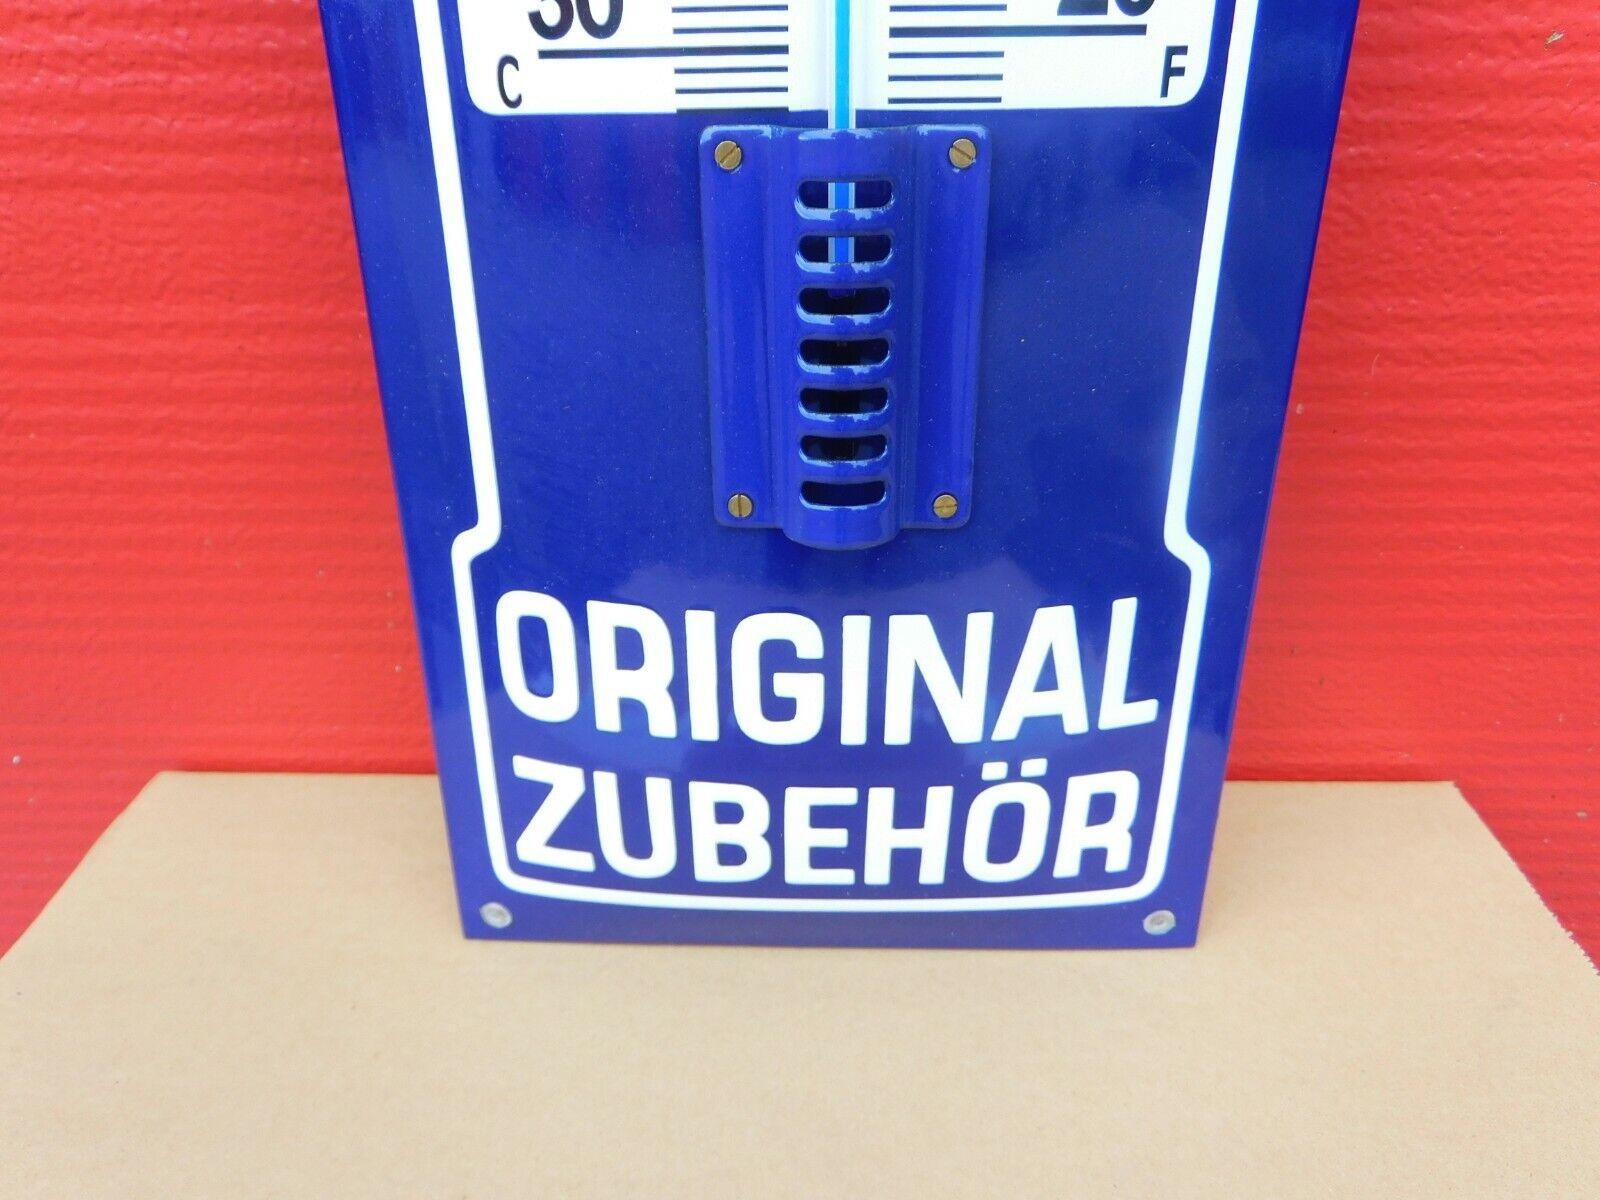 VESPA Scooter - German Original Zubehor Porcelain Enamel Sign with Thermometer